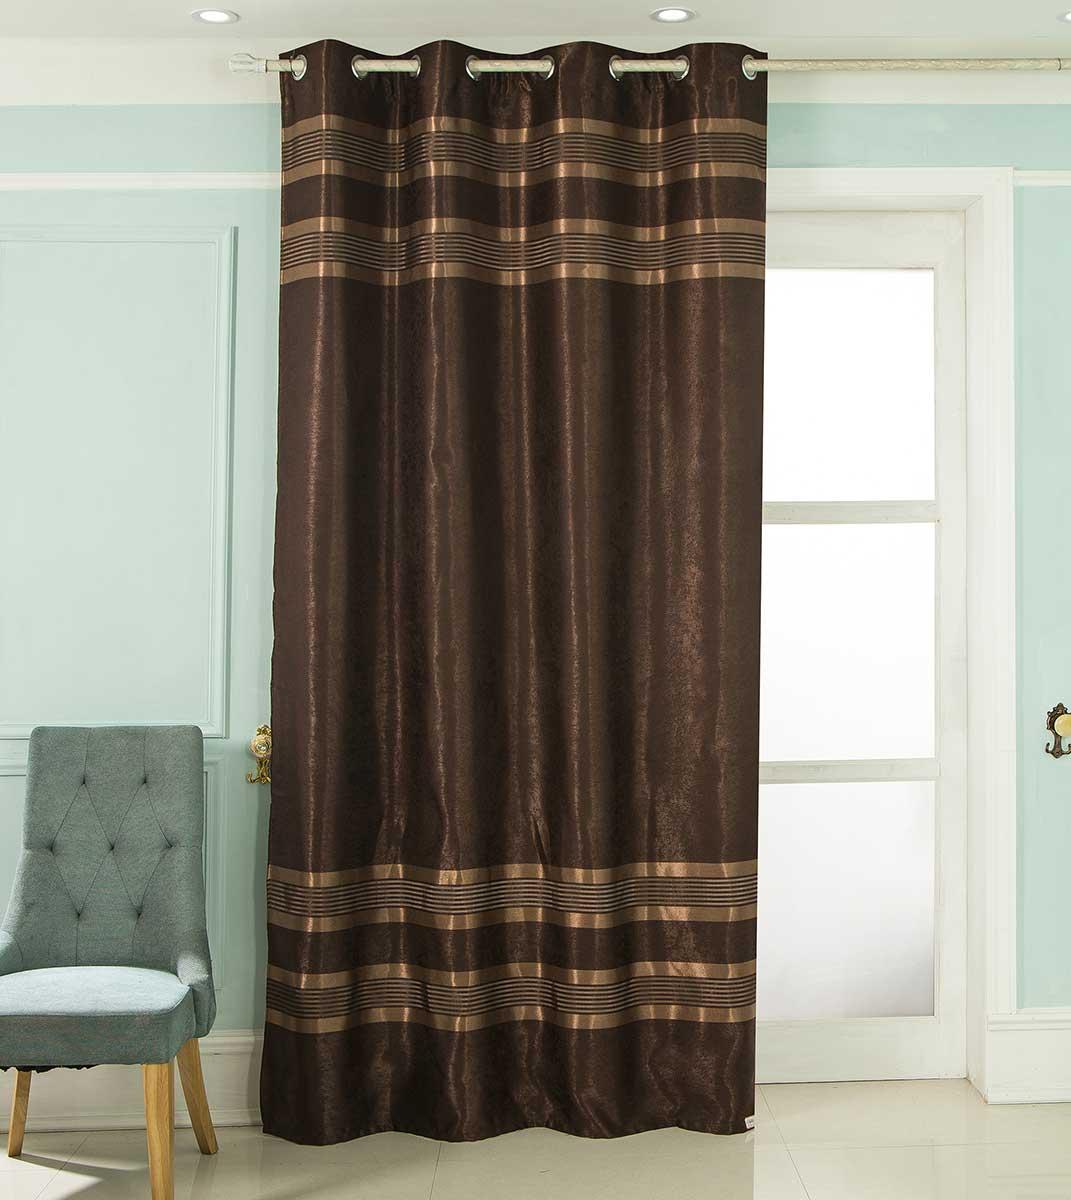 rideau occultant rayures chocolat noir bordeaux rouge taupe gris orange. Black Bedroom Furniture Sets. Home Design Ideas